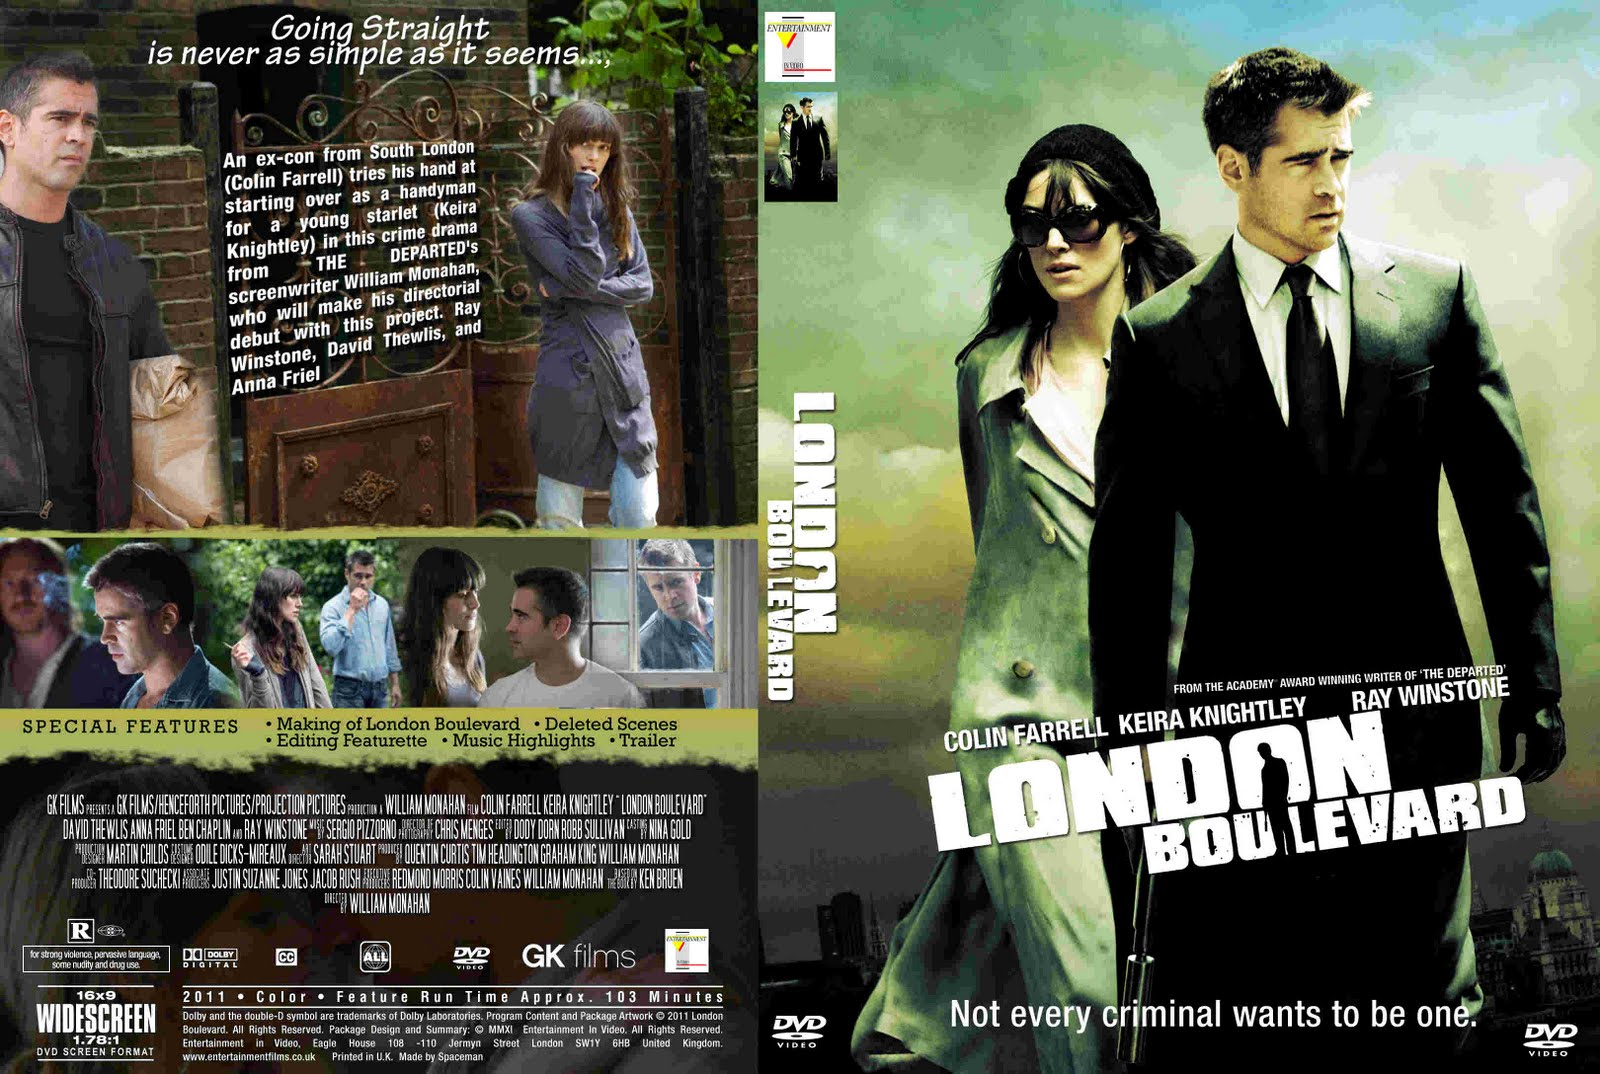 http://4.bp.blogspot.com/-Ql0GWAu2iLs/TeTQjTXQw0I/AAAAAAAAASU/szCyz8G2ELw/s1600/London%2BBoulevard.jpg